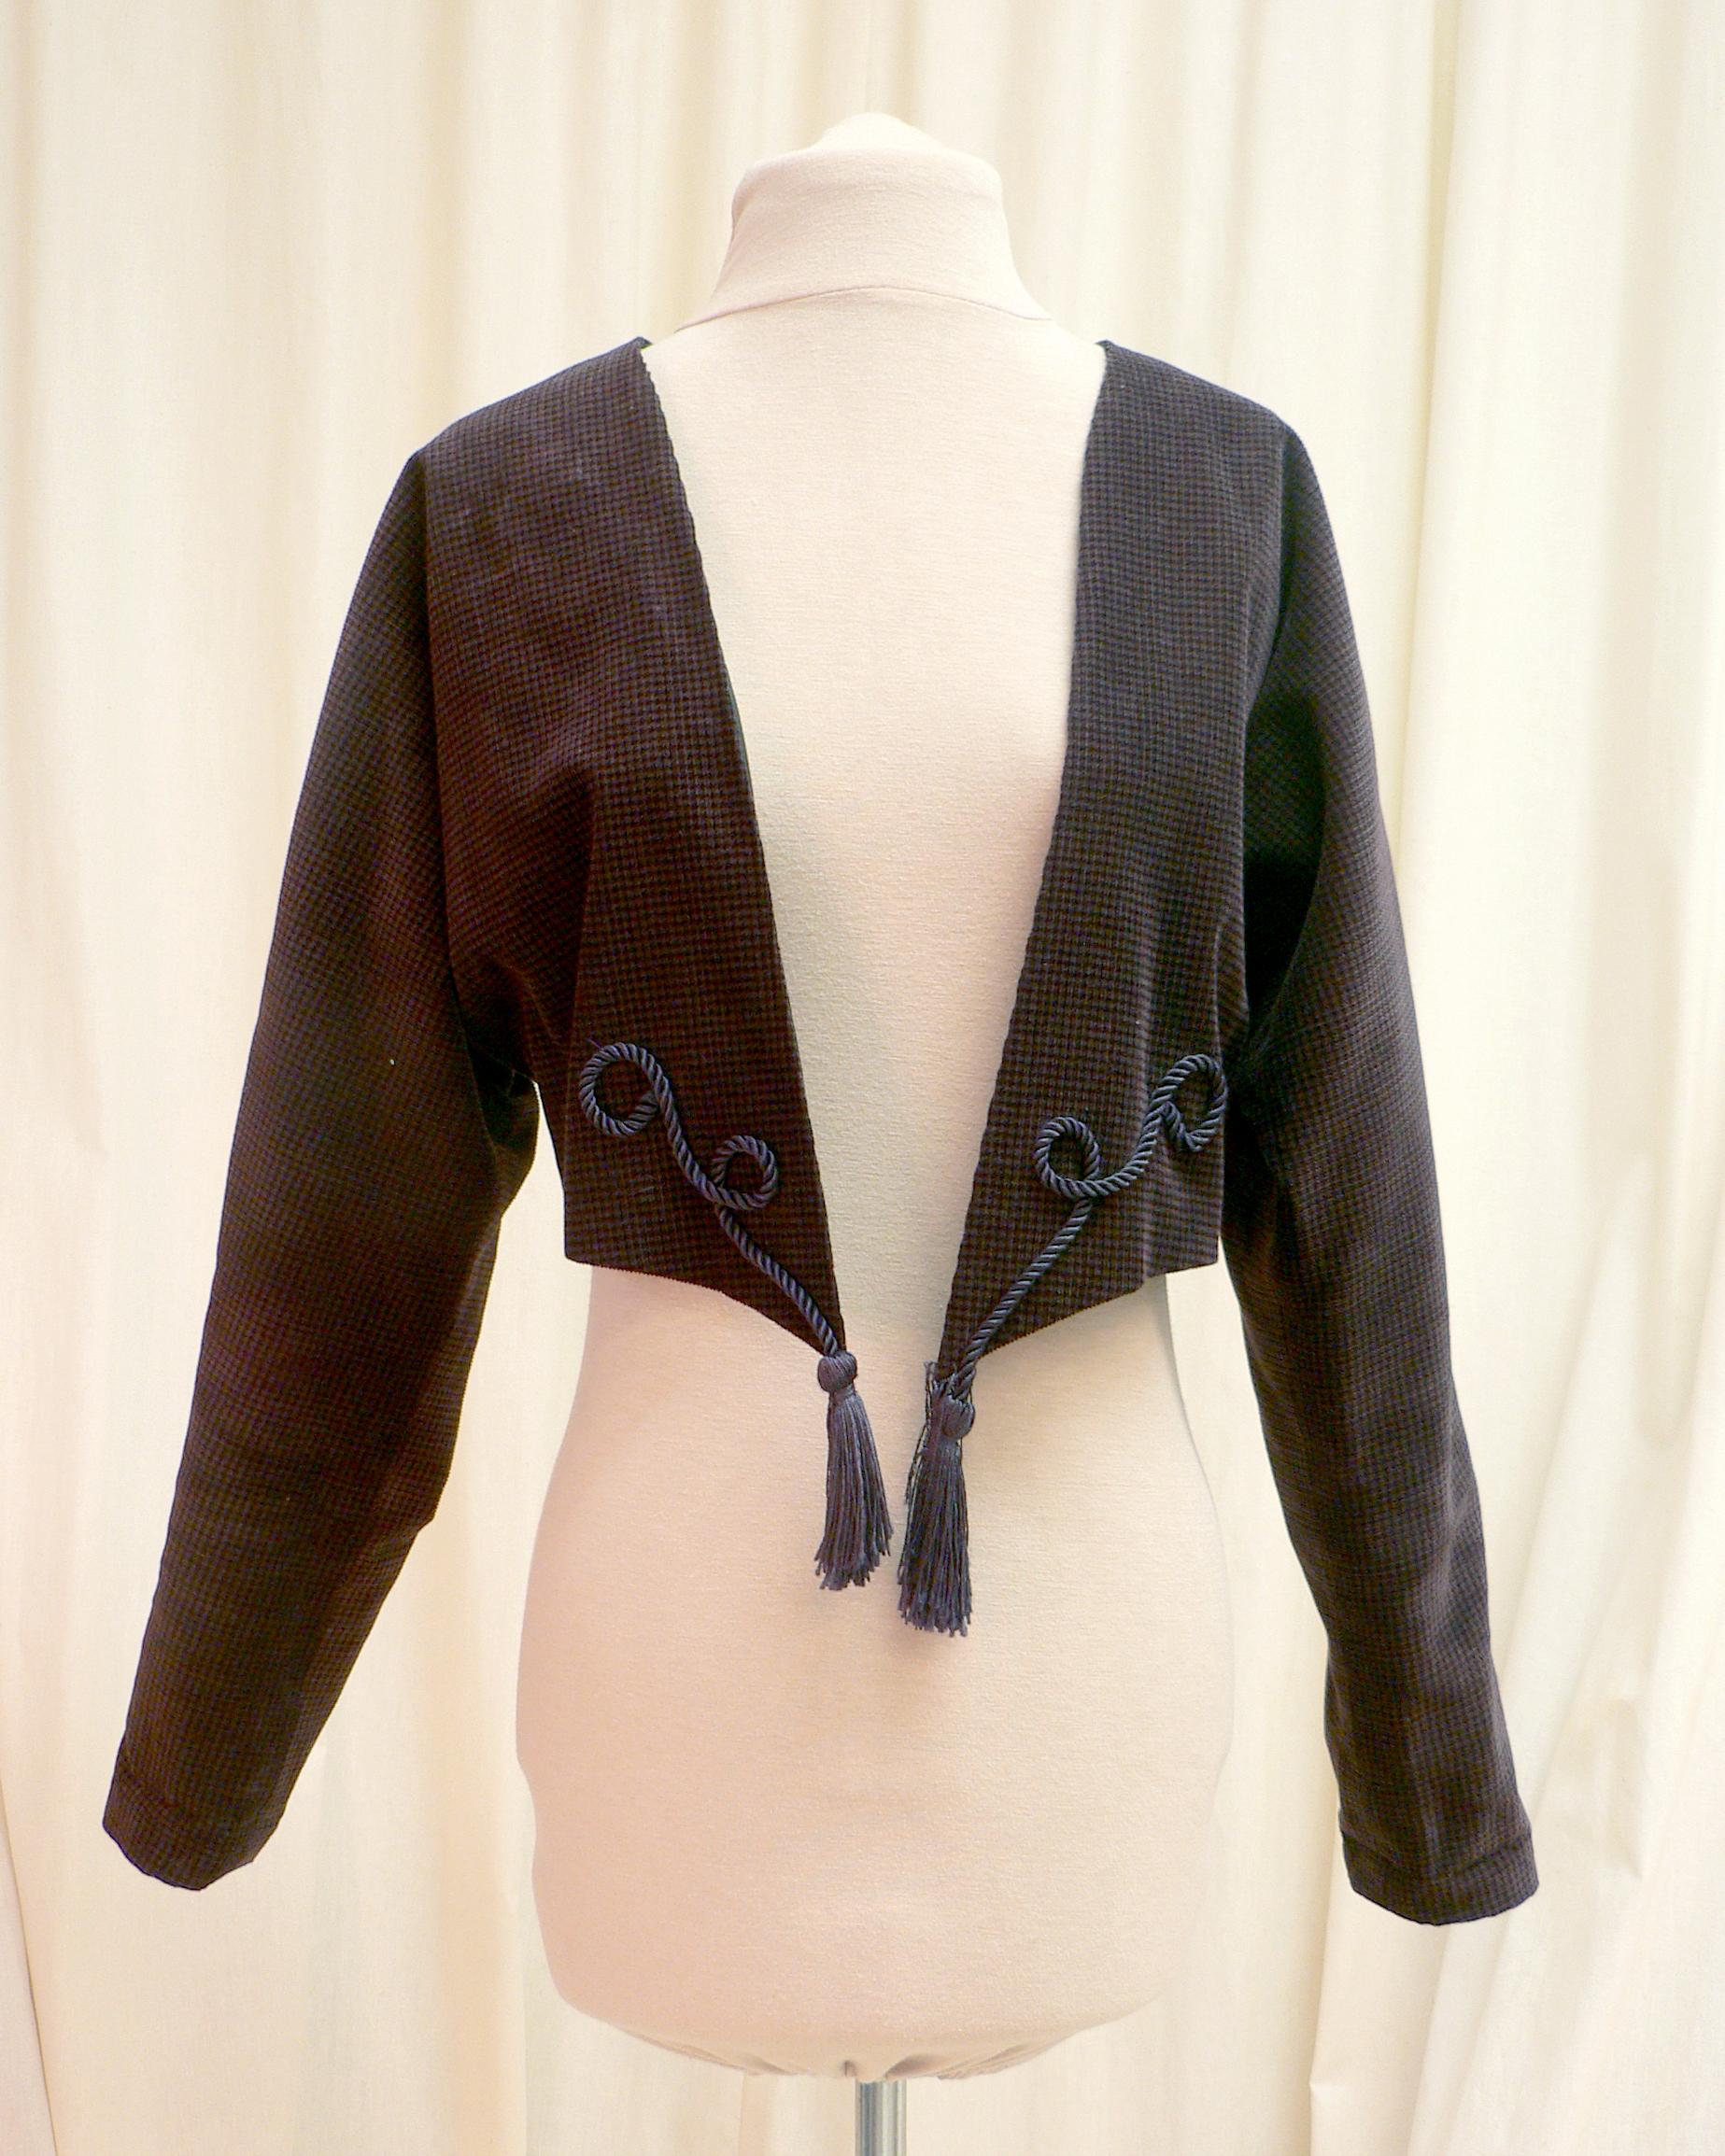 jacket16_front.jpg